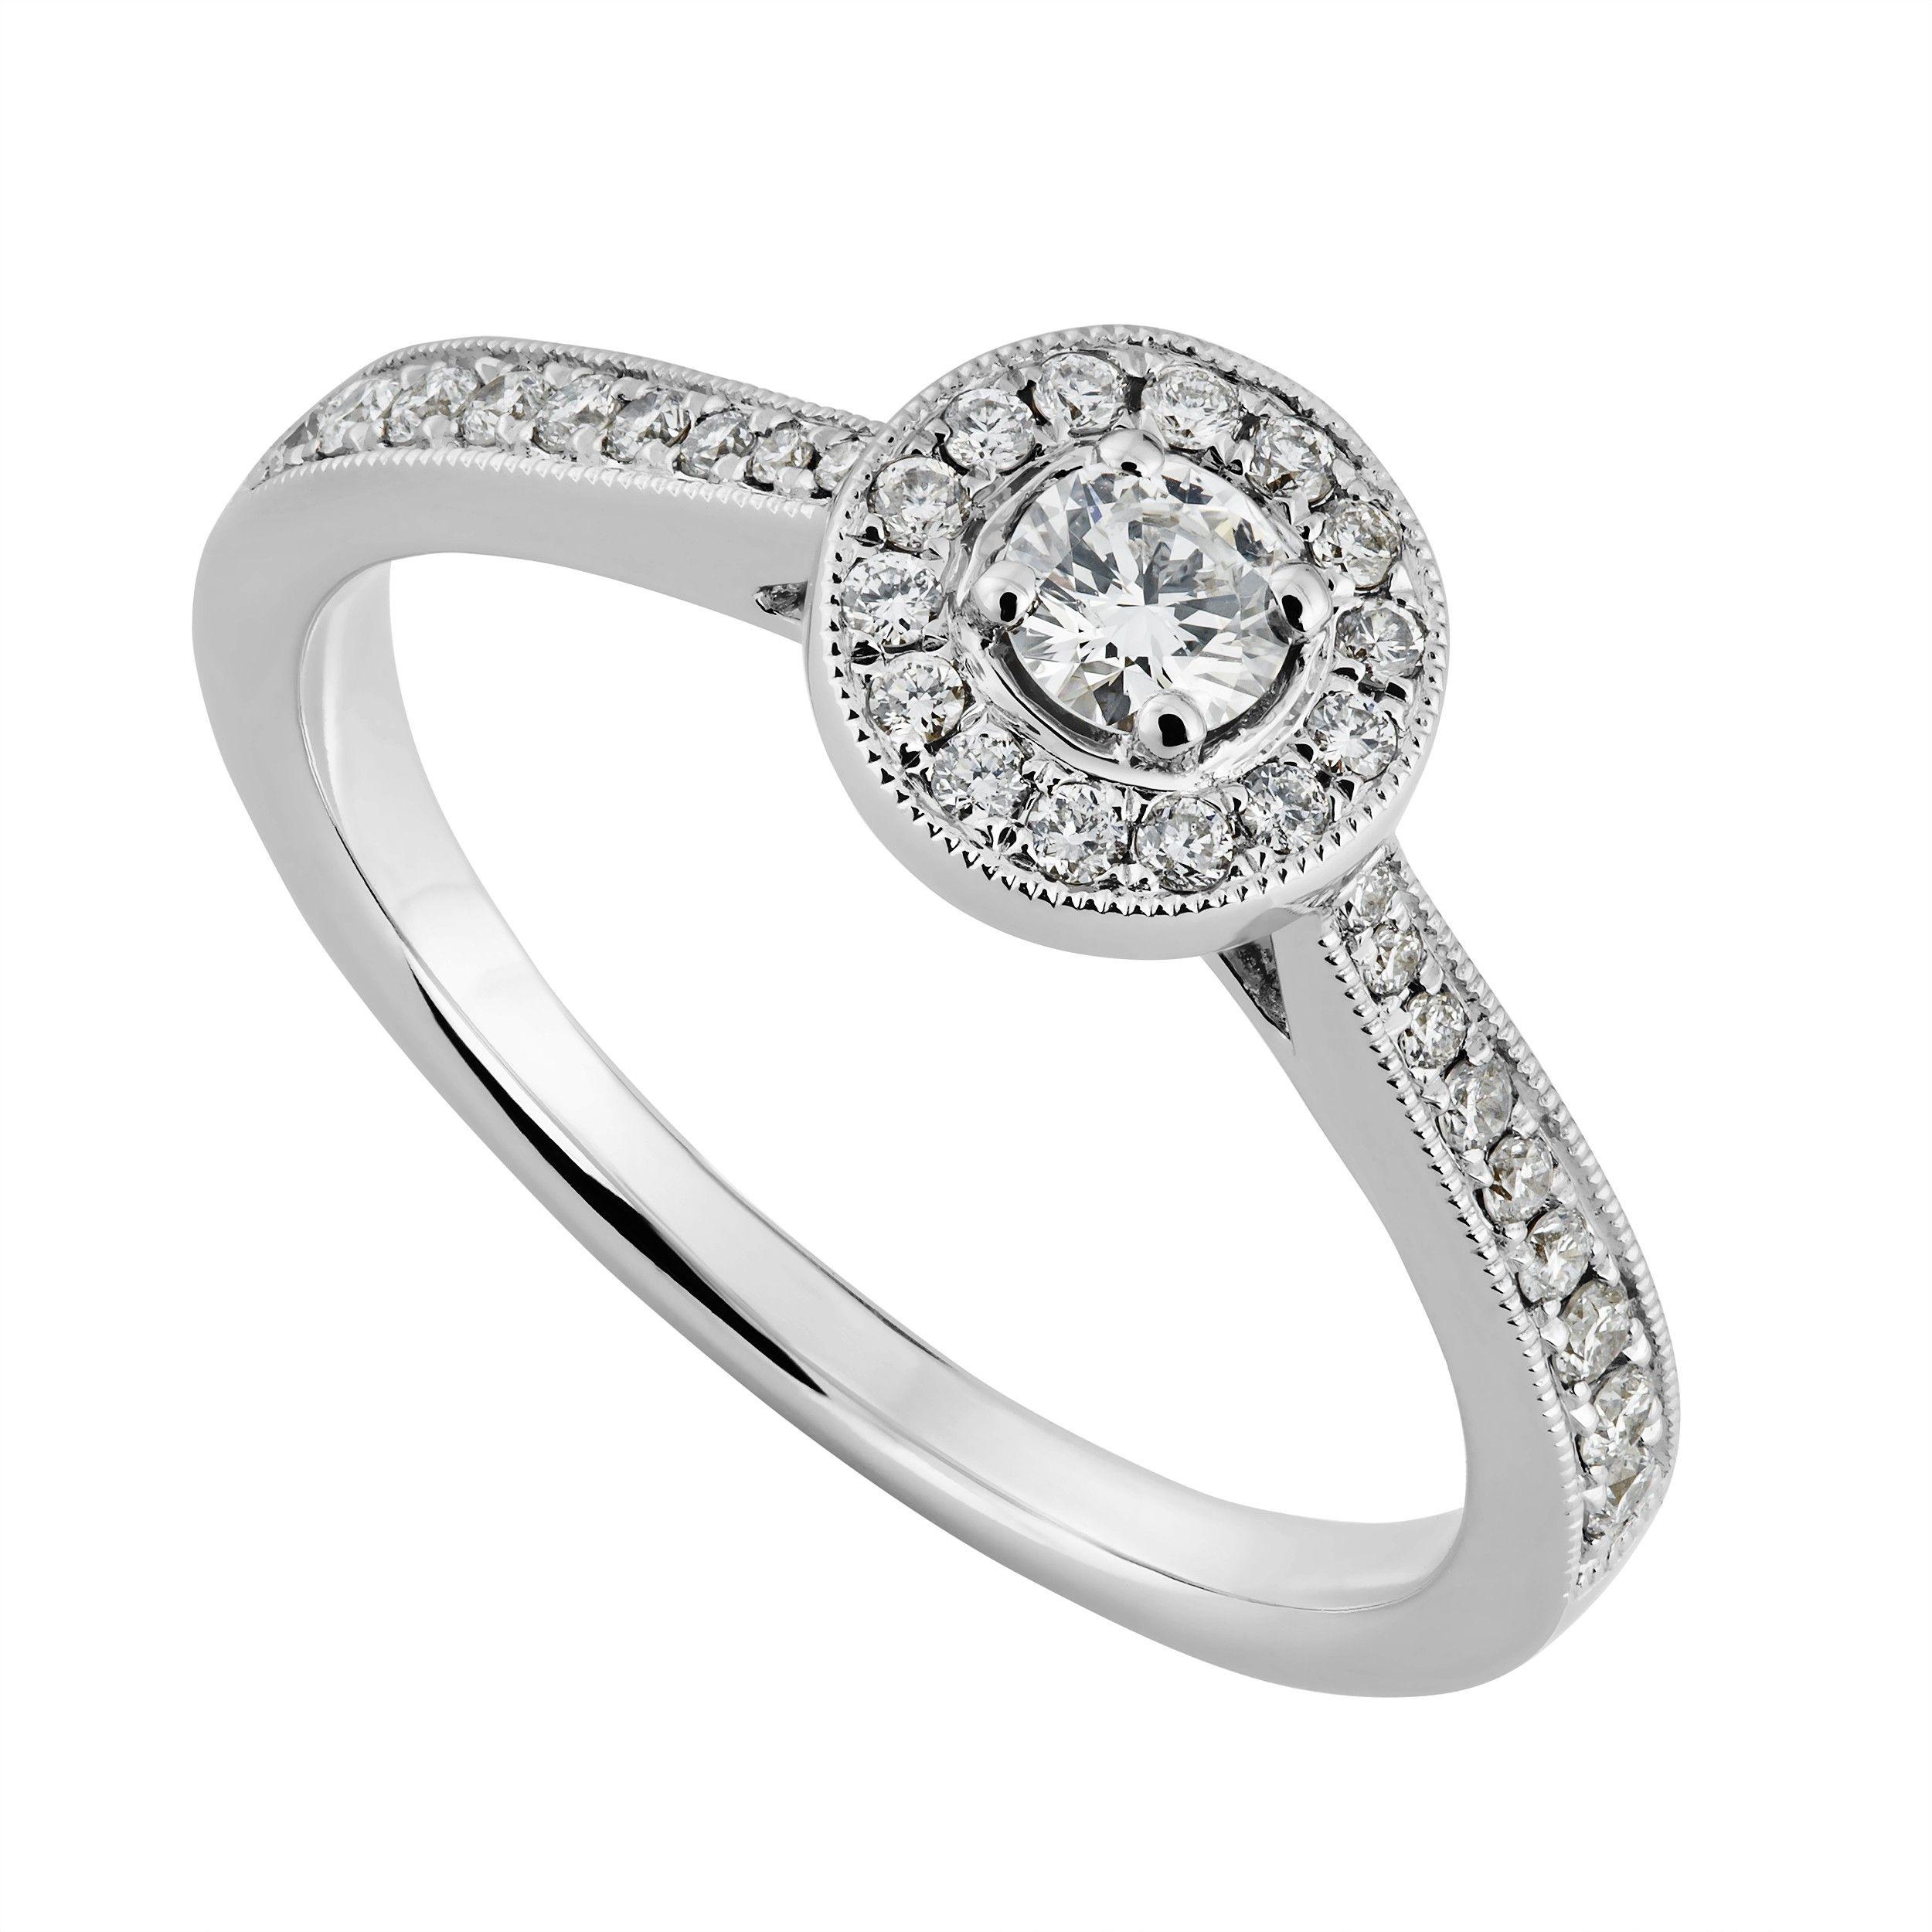 18ct White Gold 034 Carat Diamond Cluster Ring